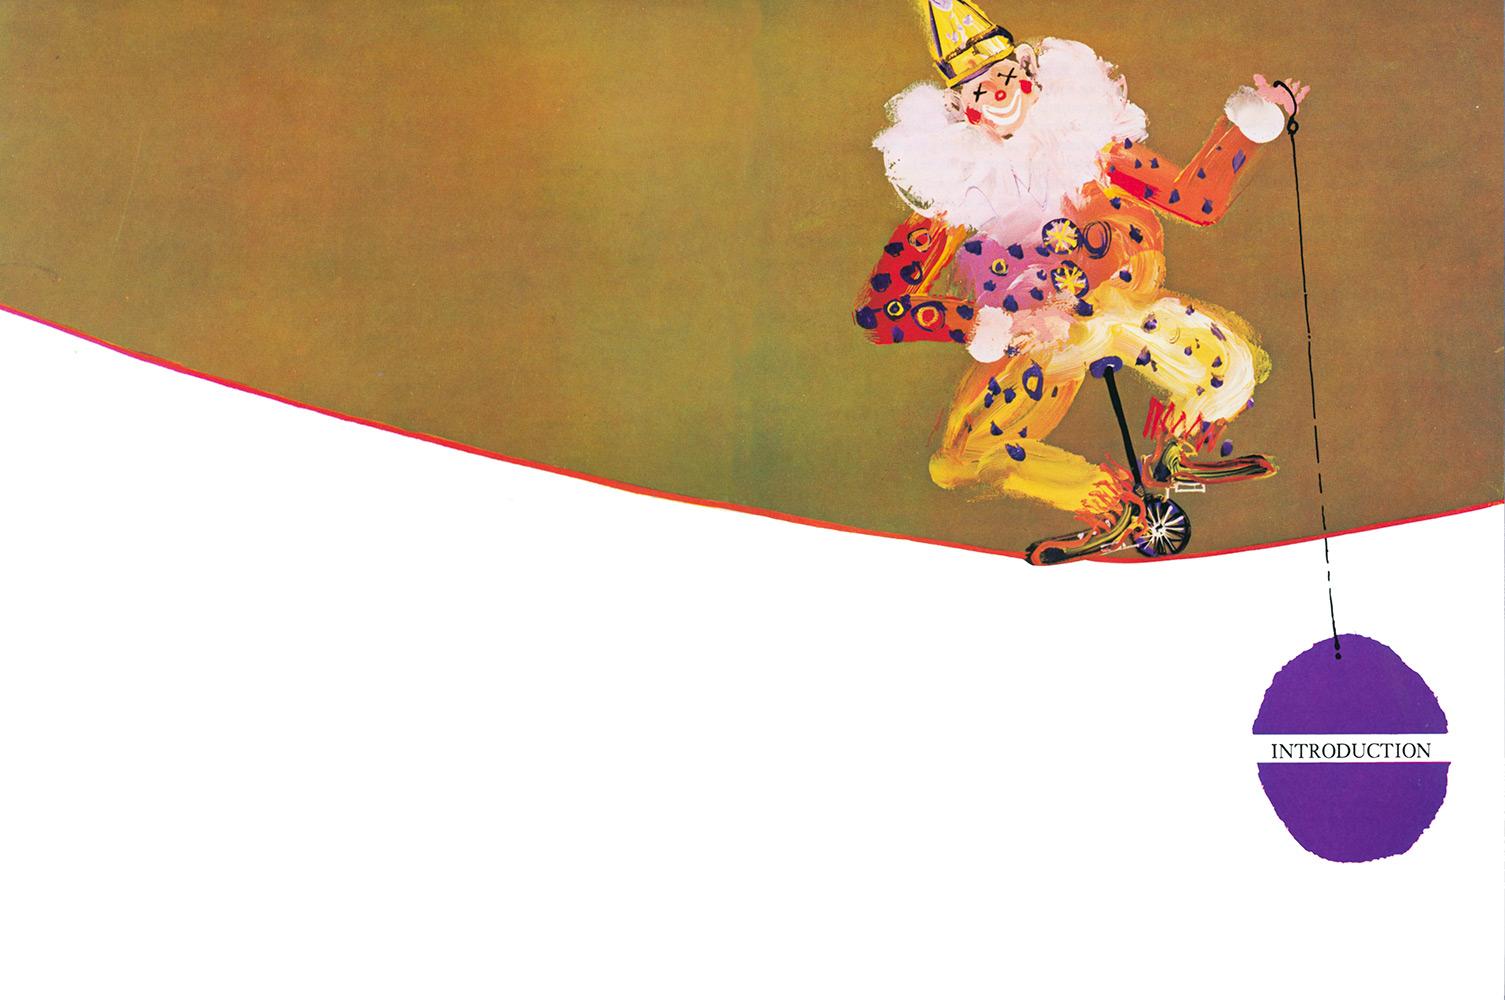 Oxford-book-of-poetry-for-children-clown-illustation-Brian-Wildsmith.jpg